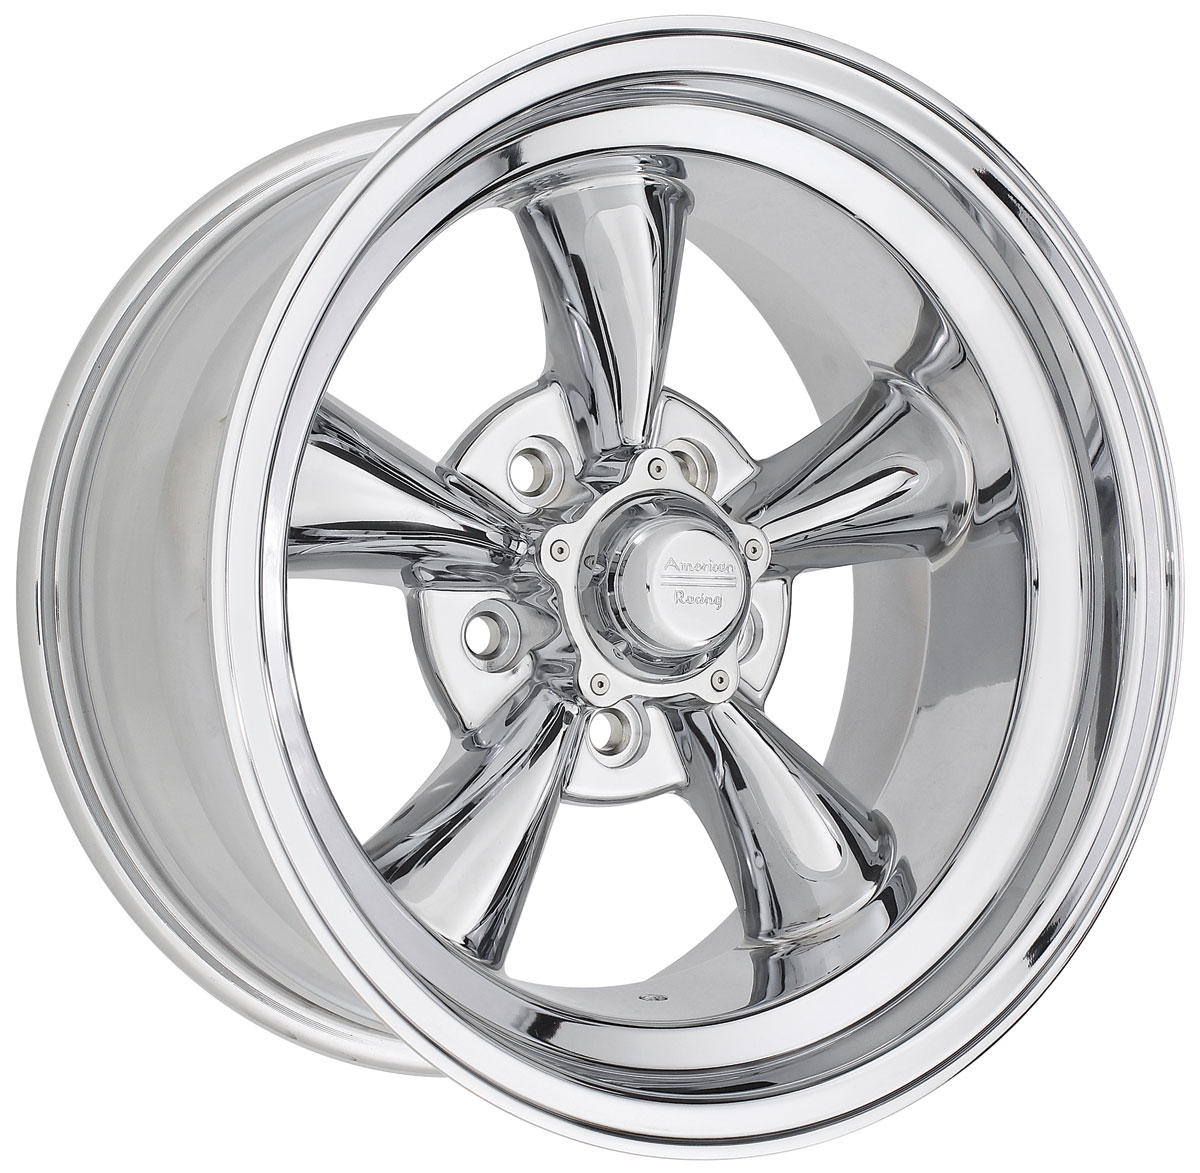 Wheel, American Racing, Torq-Thrust D, 15